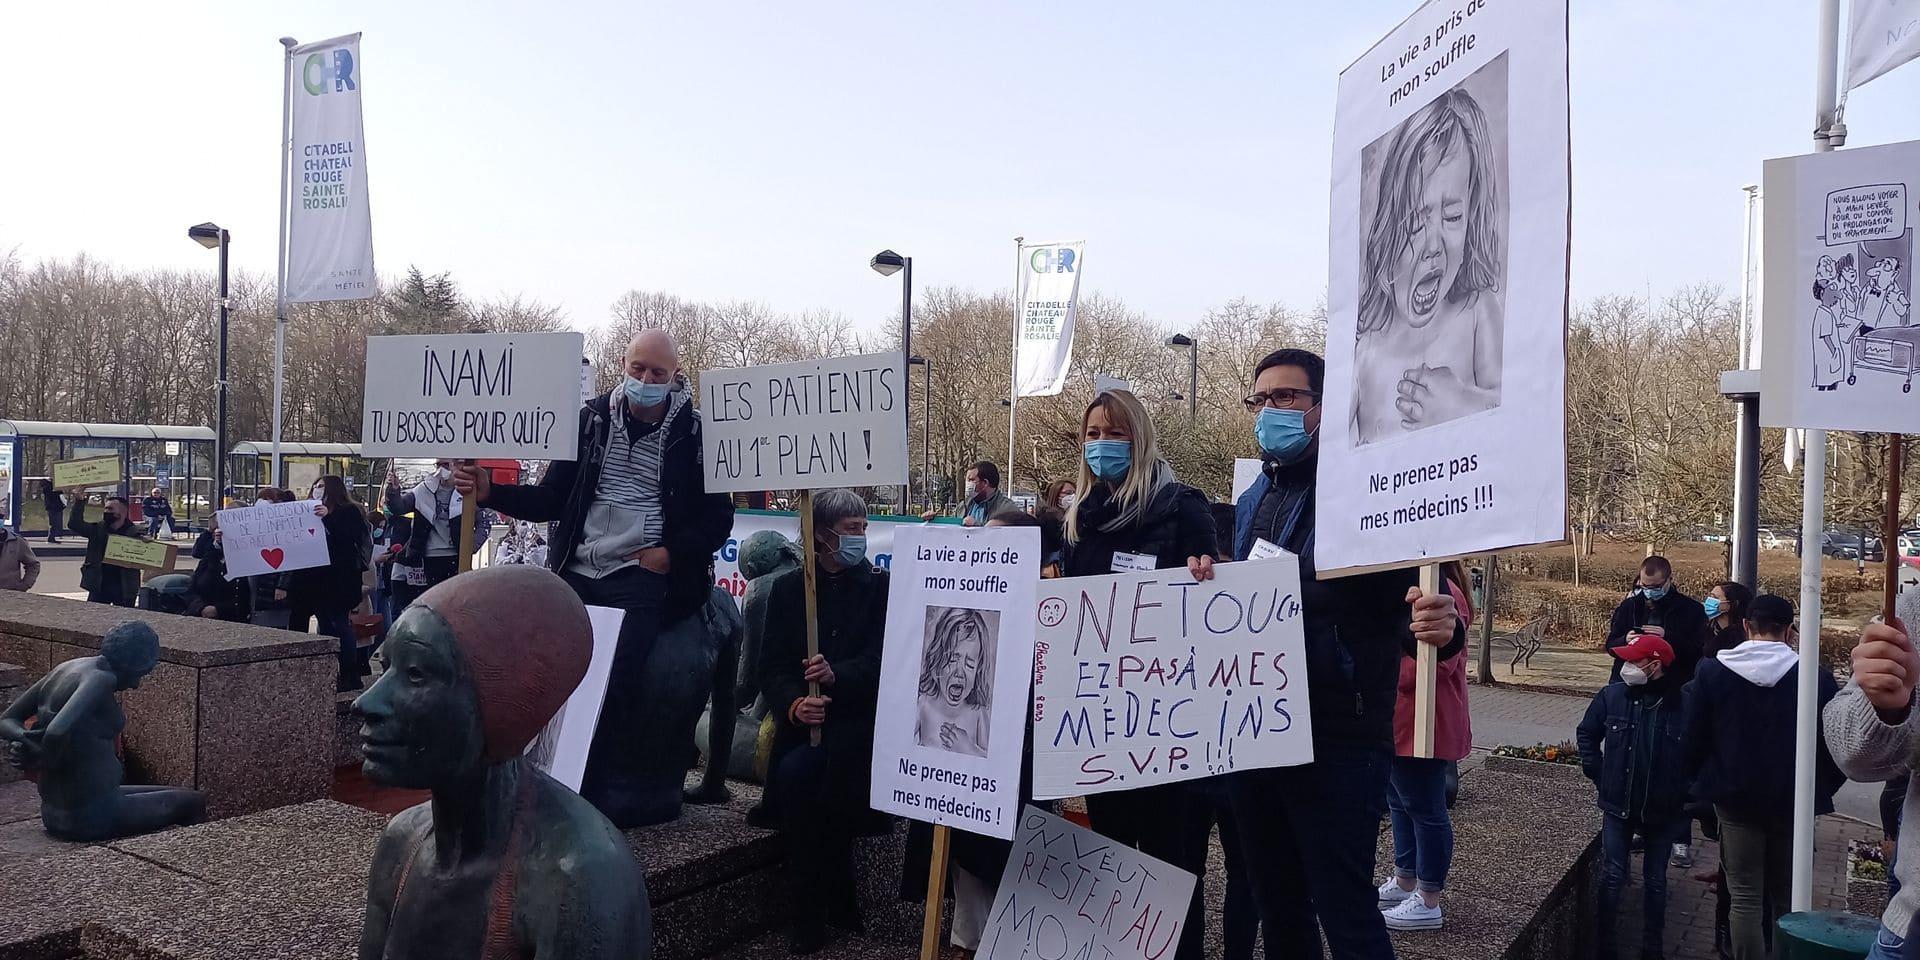 Manifestation devant la Citadelle ce matin